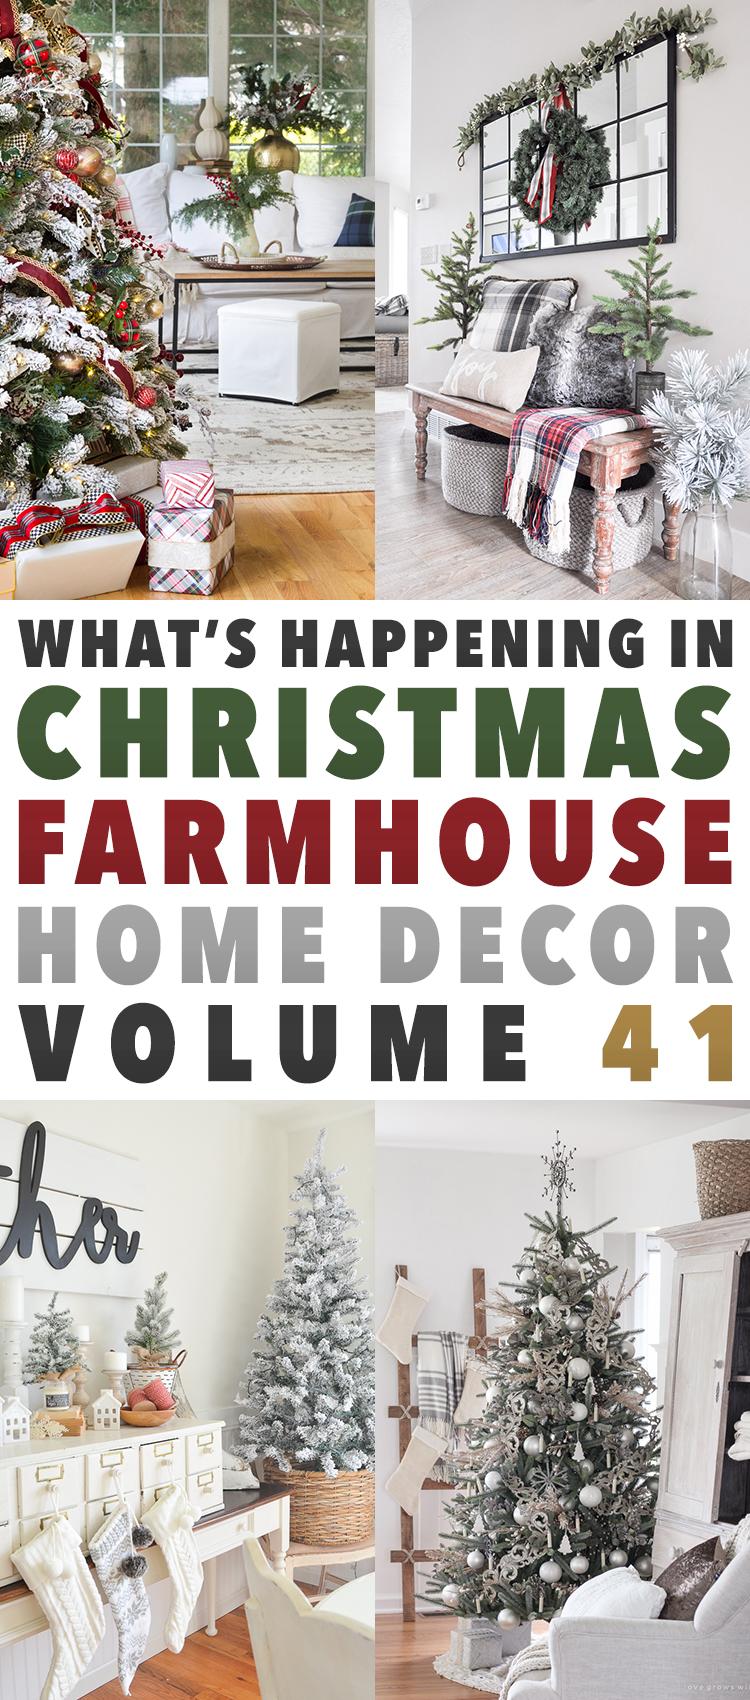 http://thecottagemarket.com/wp-content/uploads/2017/11/Farmhouse-T-1-1.jpg